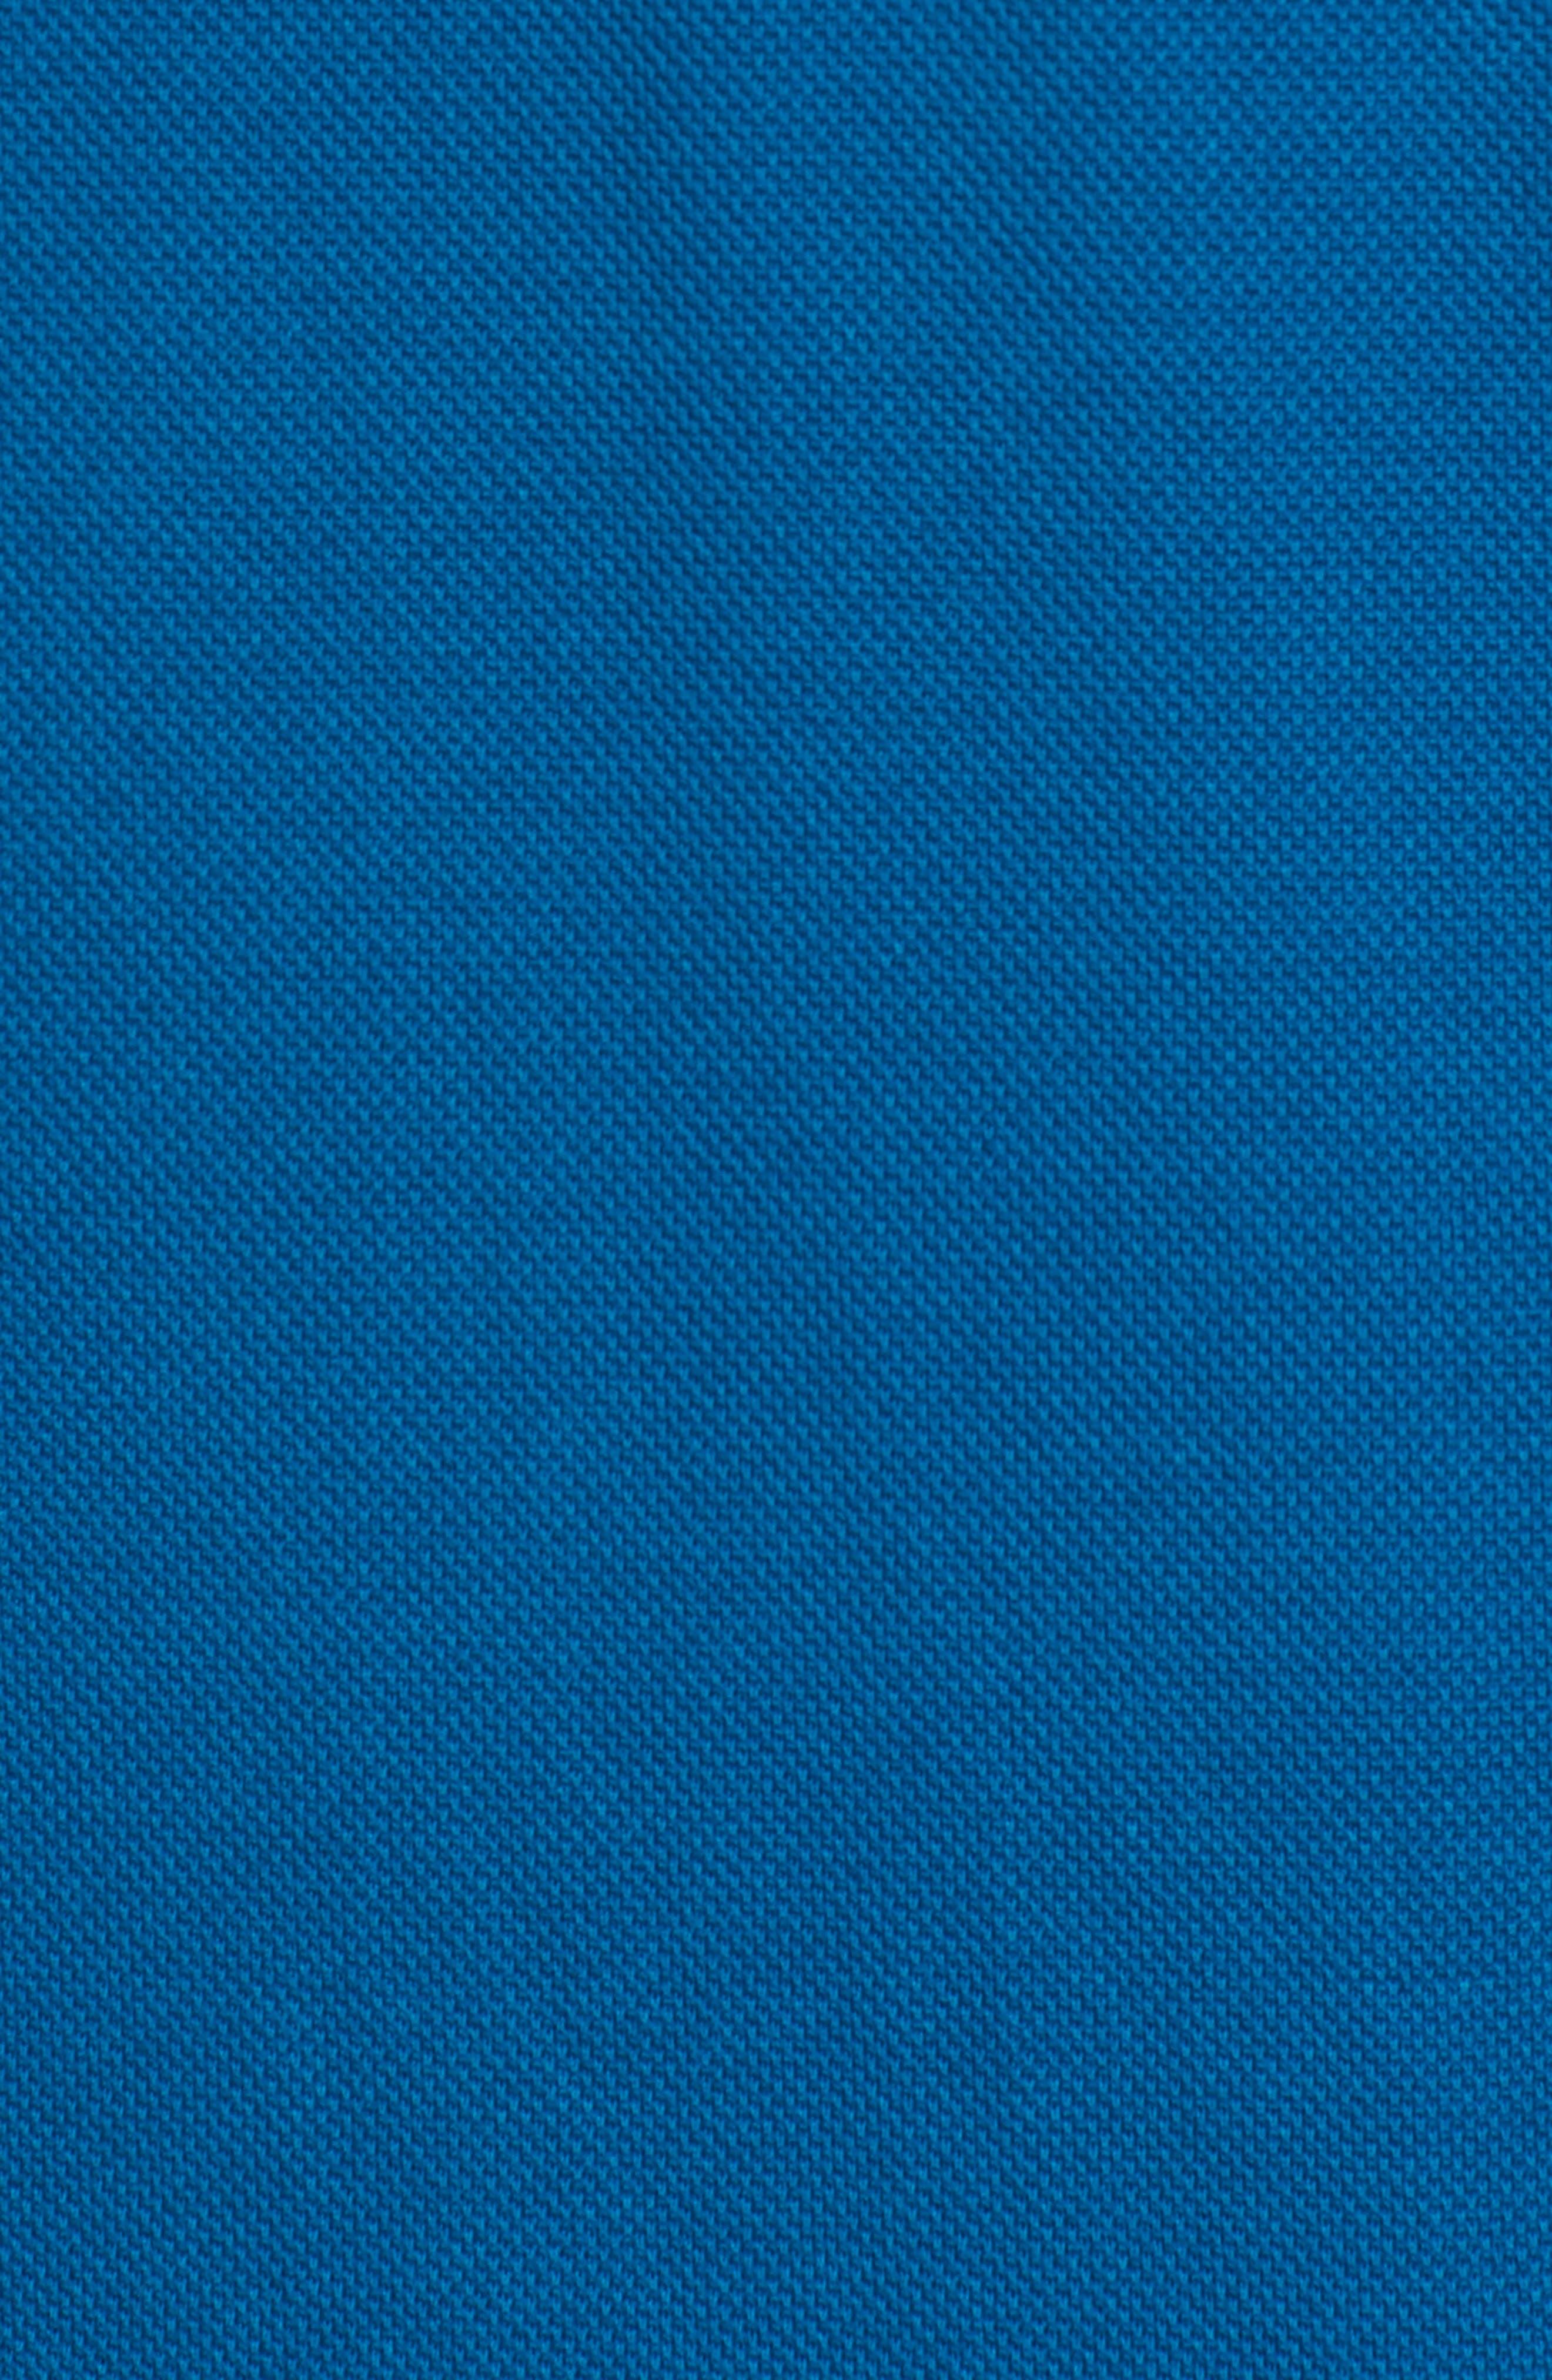 Regular Fit Knit Sport Shirt,                             Alternate thumbnail 5, color,                             445